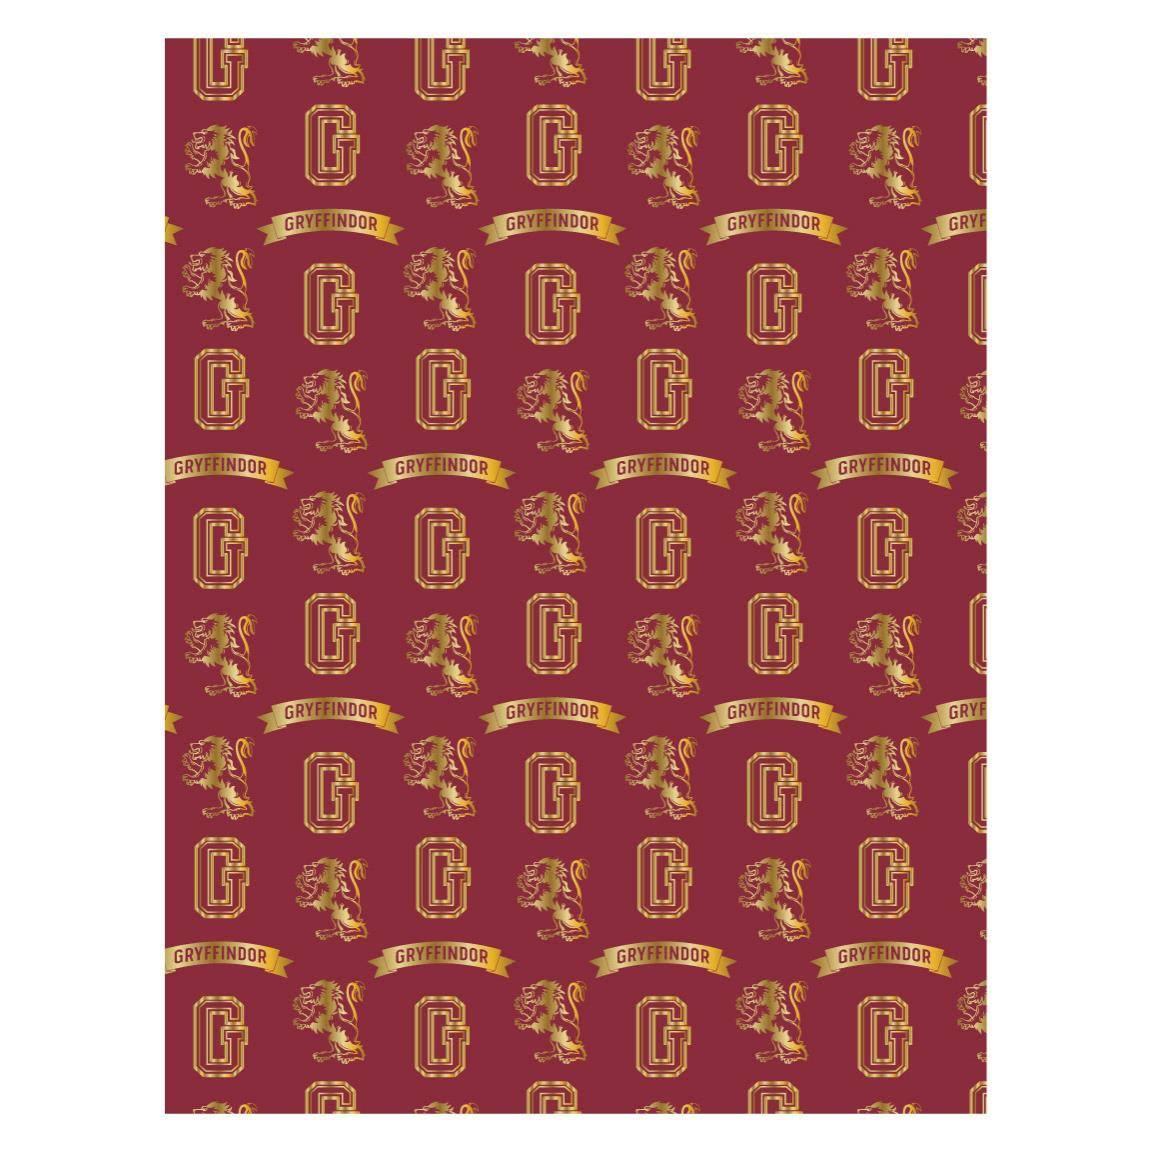 Harry Potter Fleece Blanket Gryffindor 130 x 170 cm